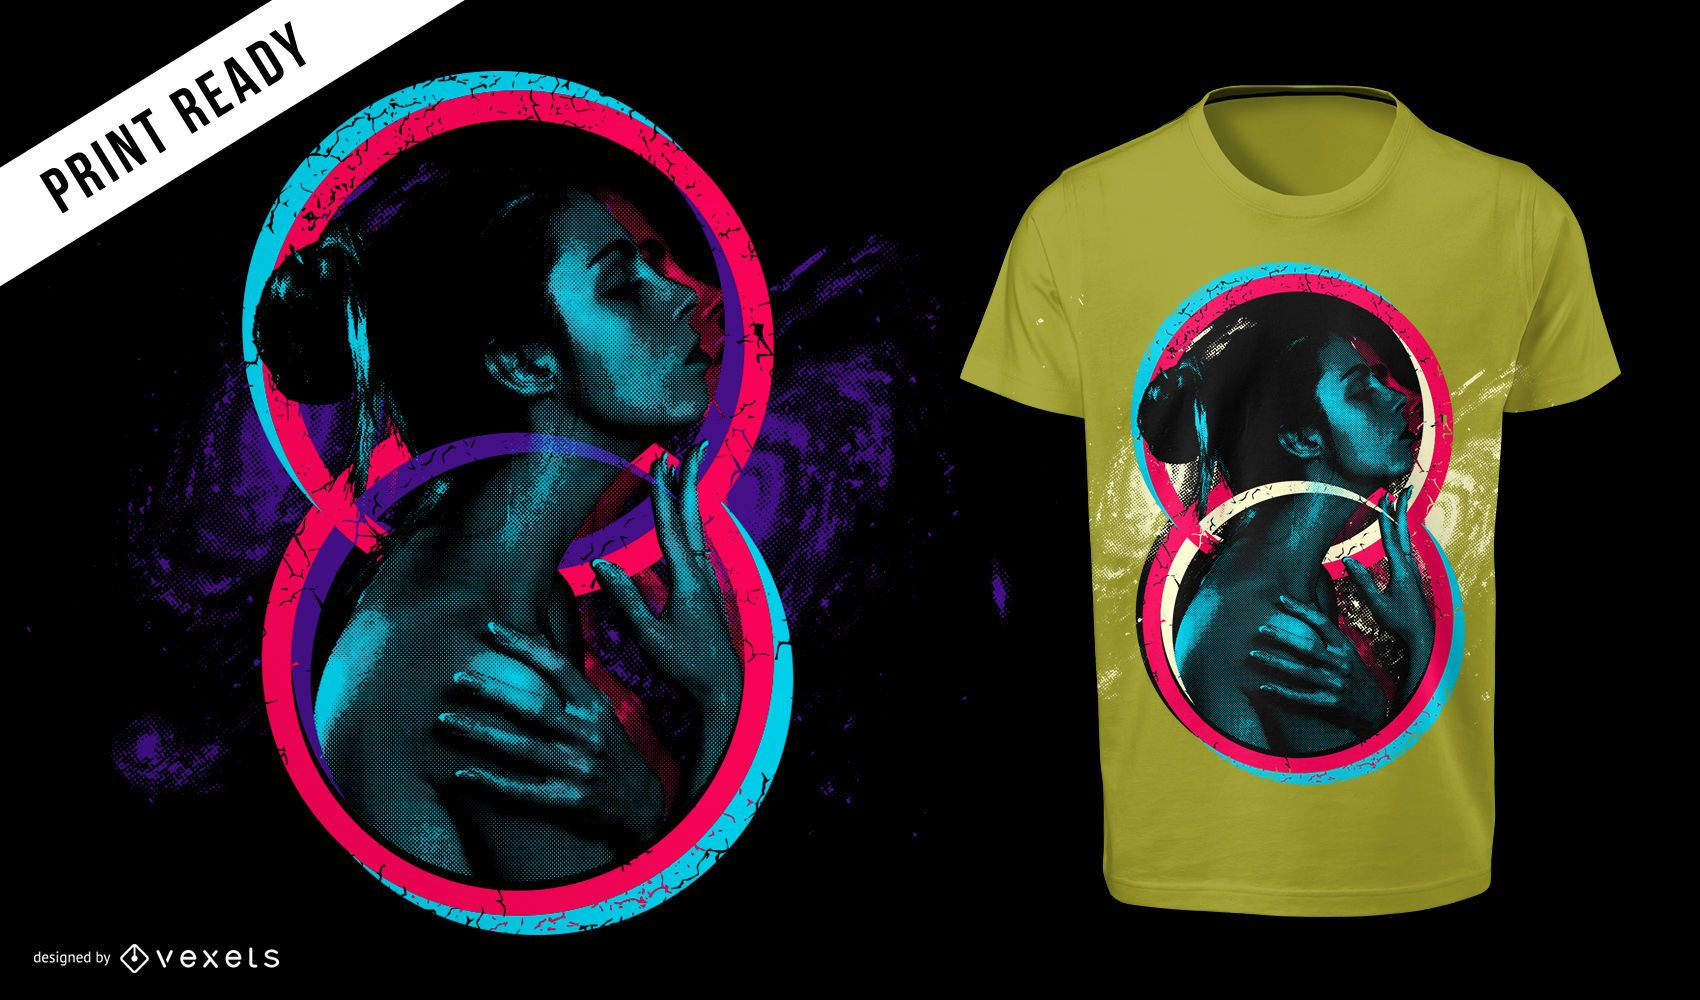 Artistic 80s Retro Style Girl T-shirt Design